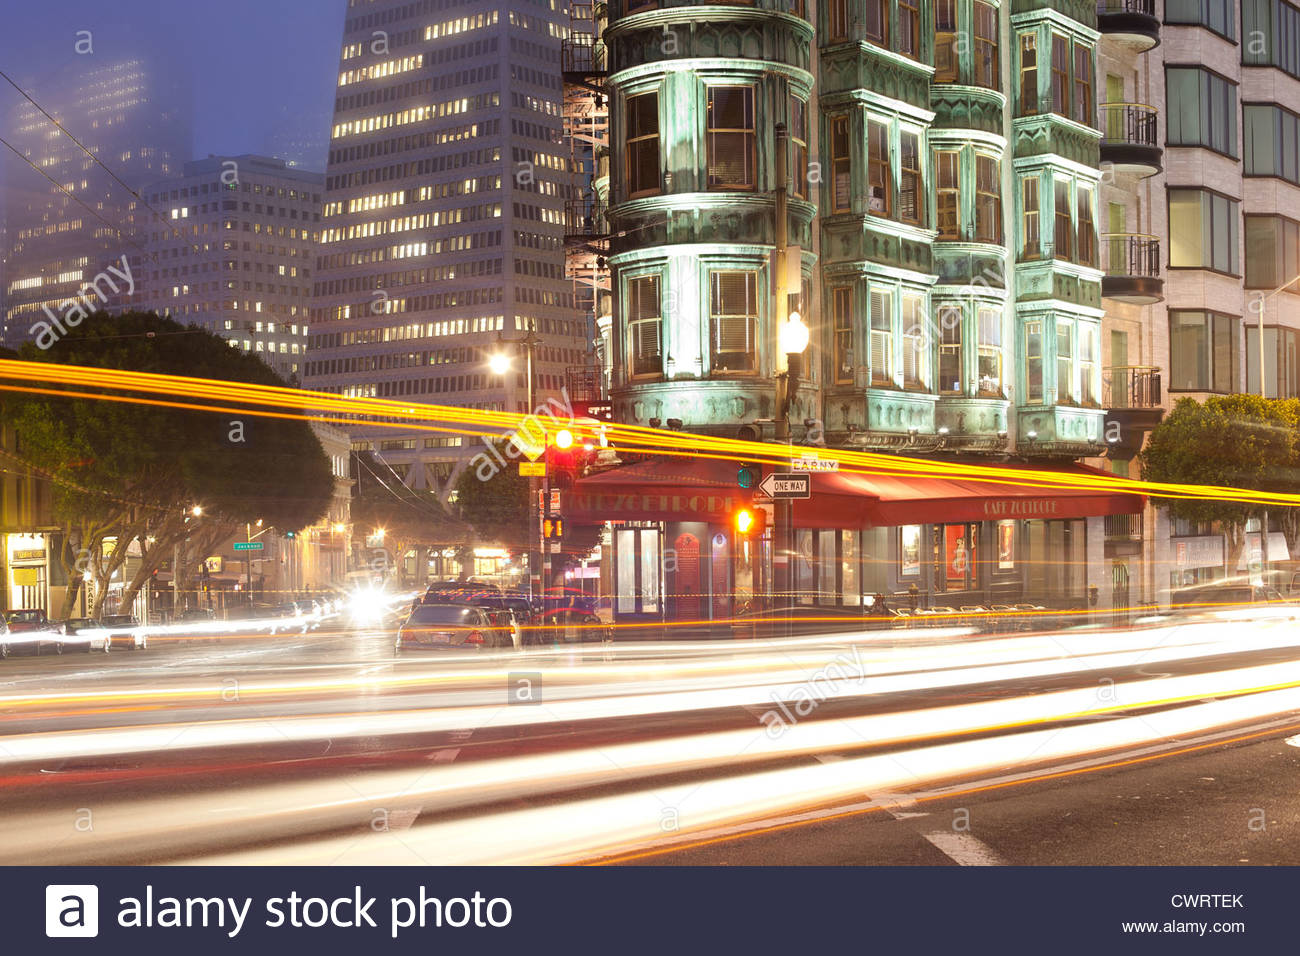 Bewegungsunschärfe auf Kearny Street und Columbus Avenue, San Francisco, Kalifornien, USA Stockbild